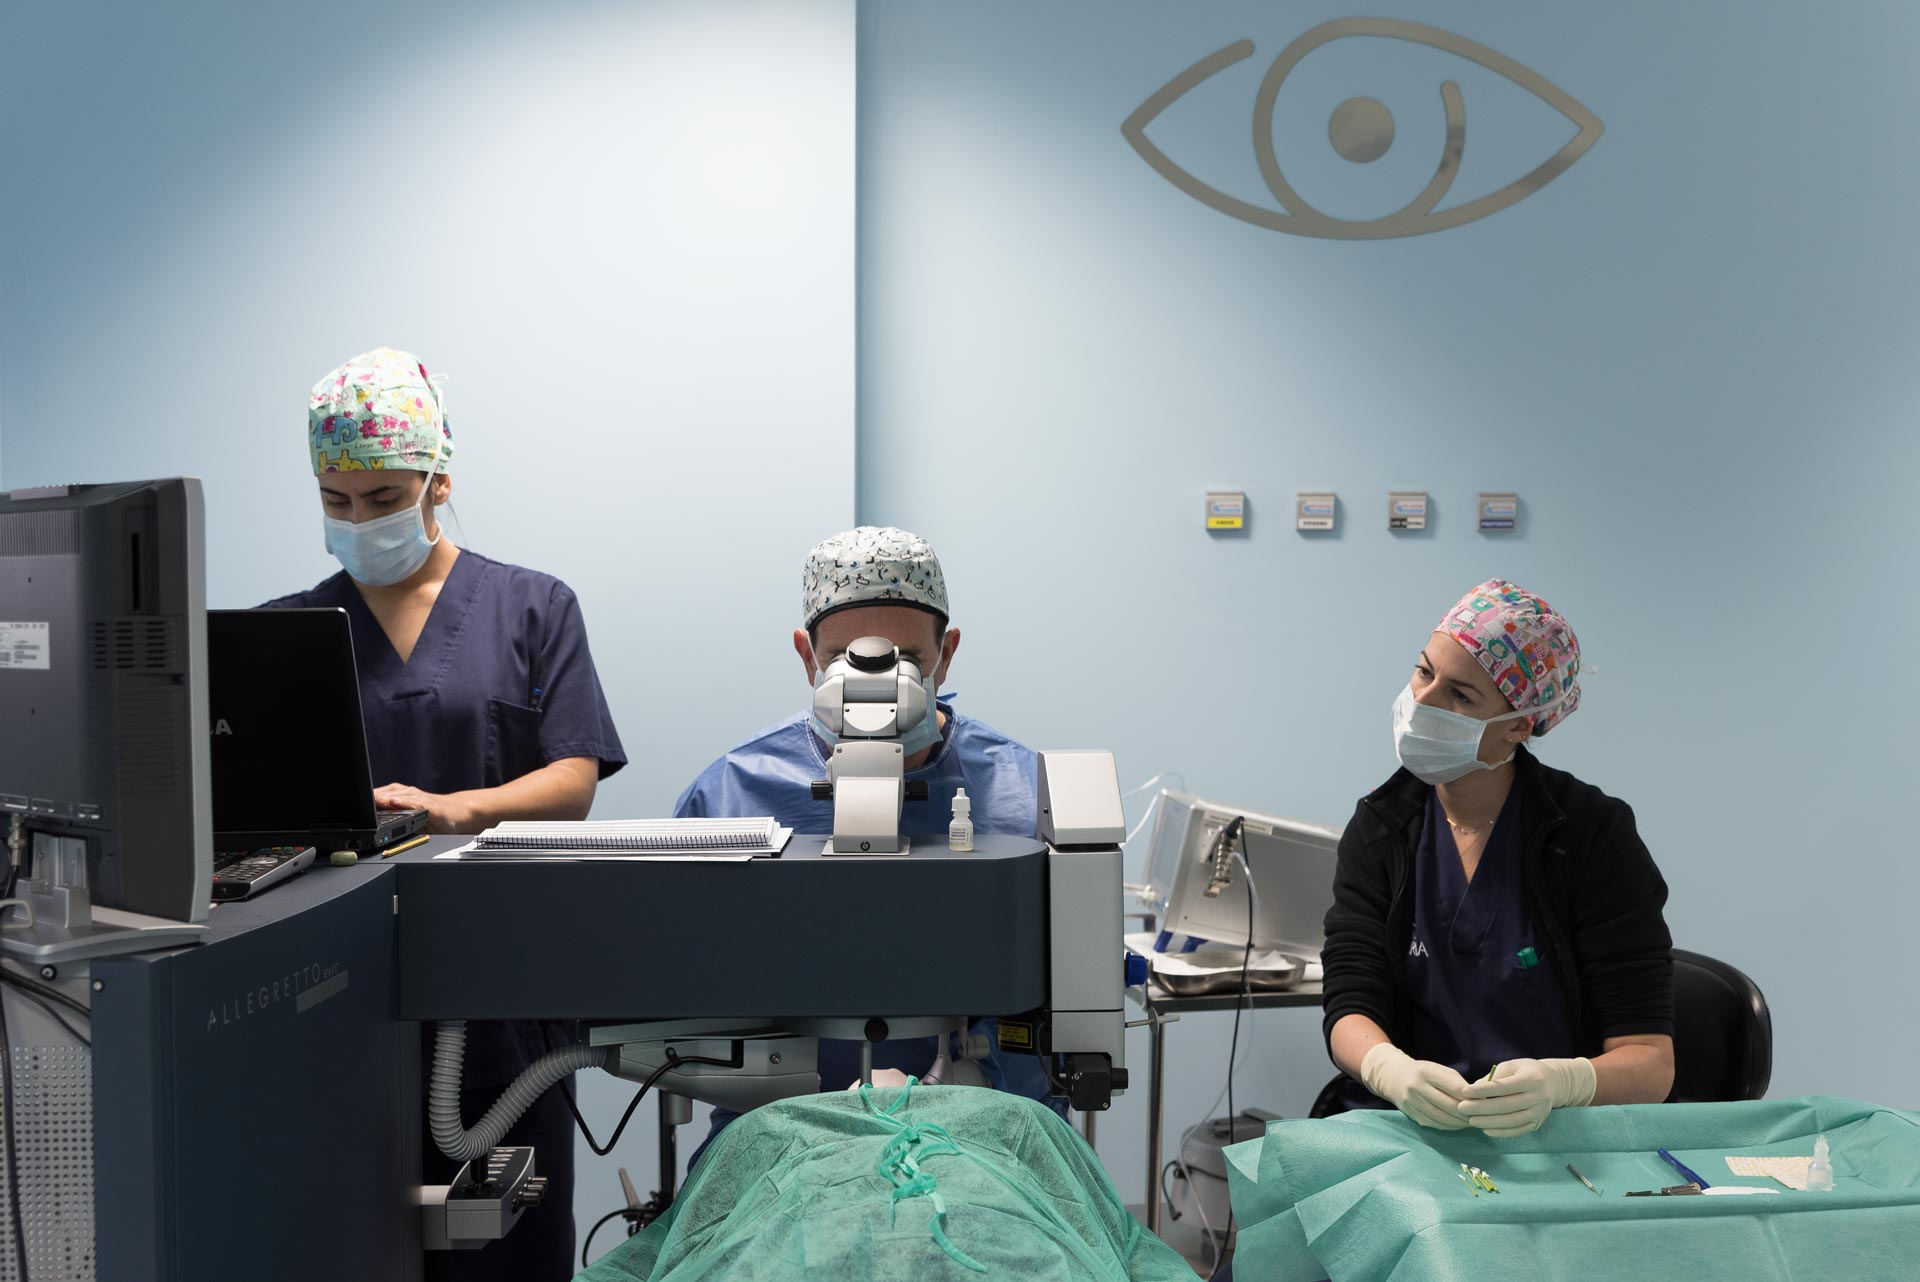 Monitorización por monitor de cirugía oftalmológica